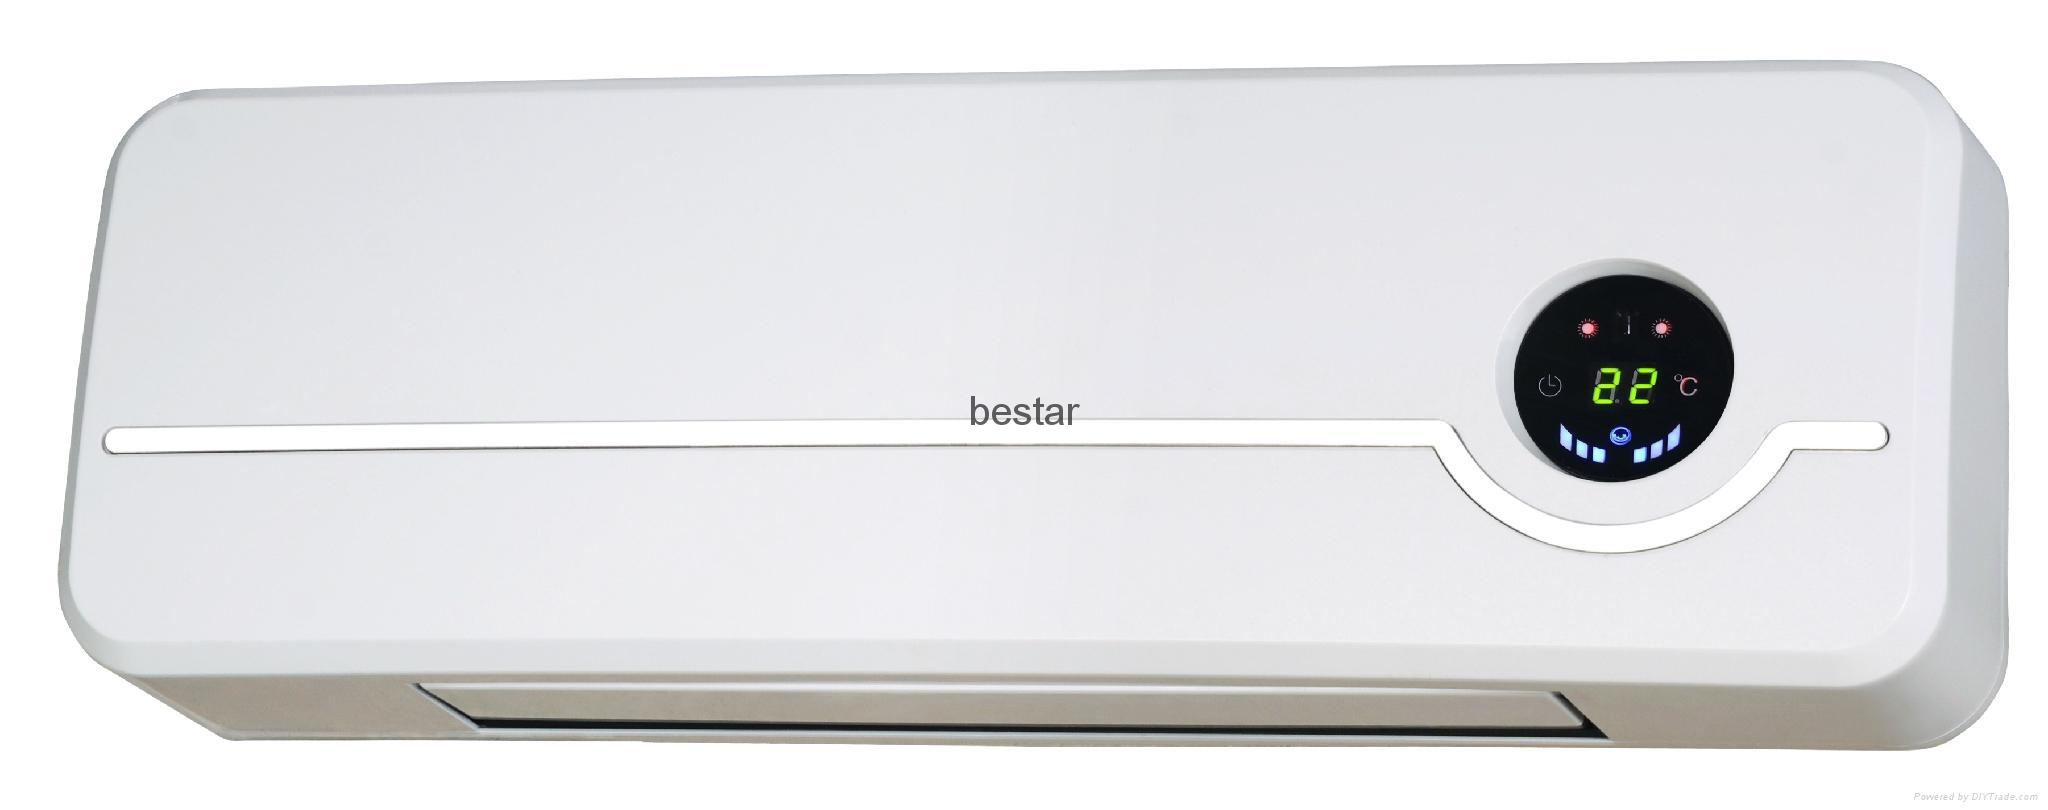 2,000 Watt Wall Mounted Electric Convection Baseboard Heater Finish: White 1